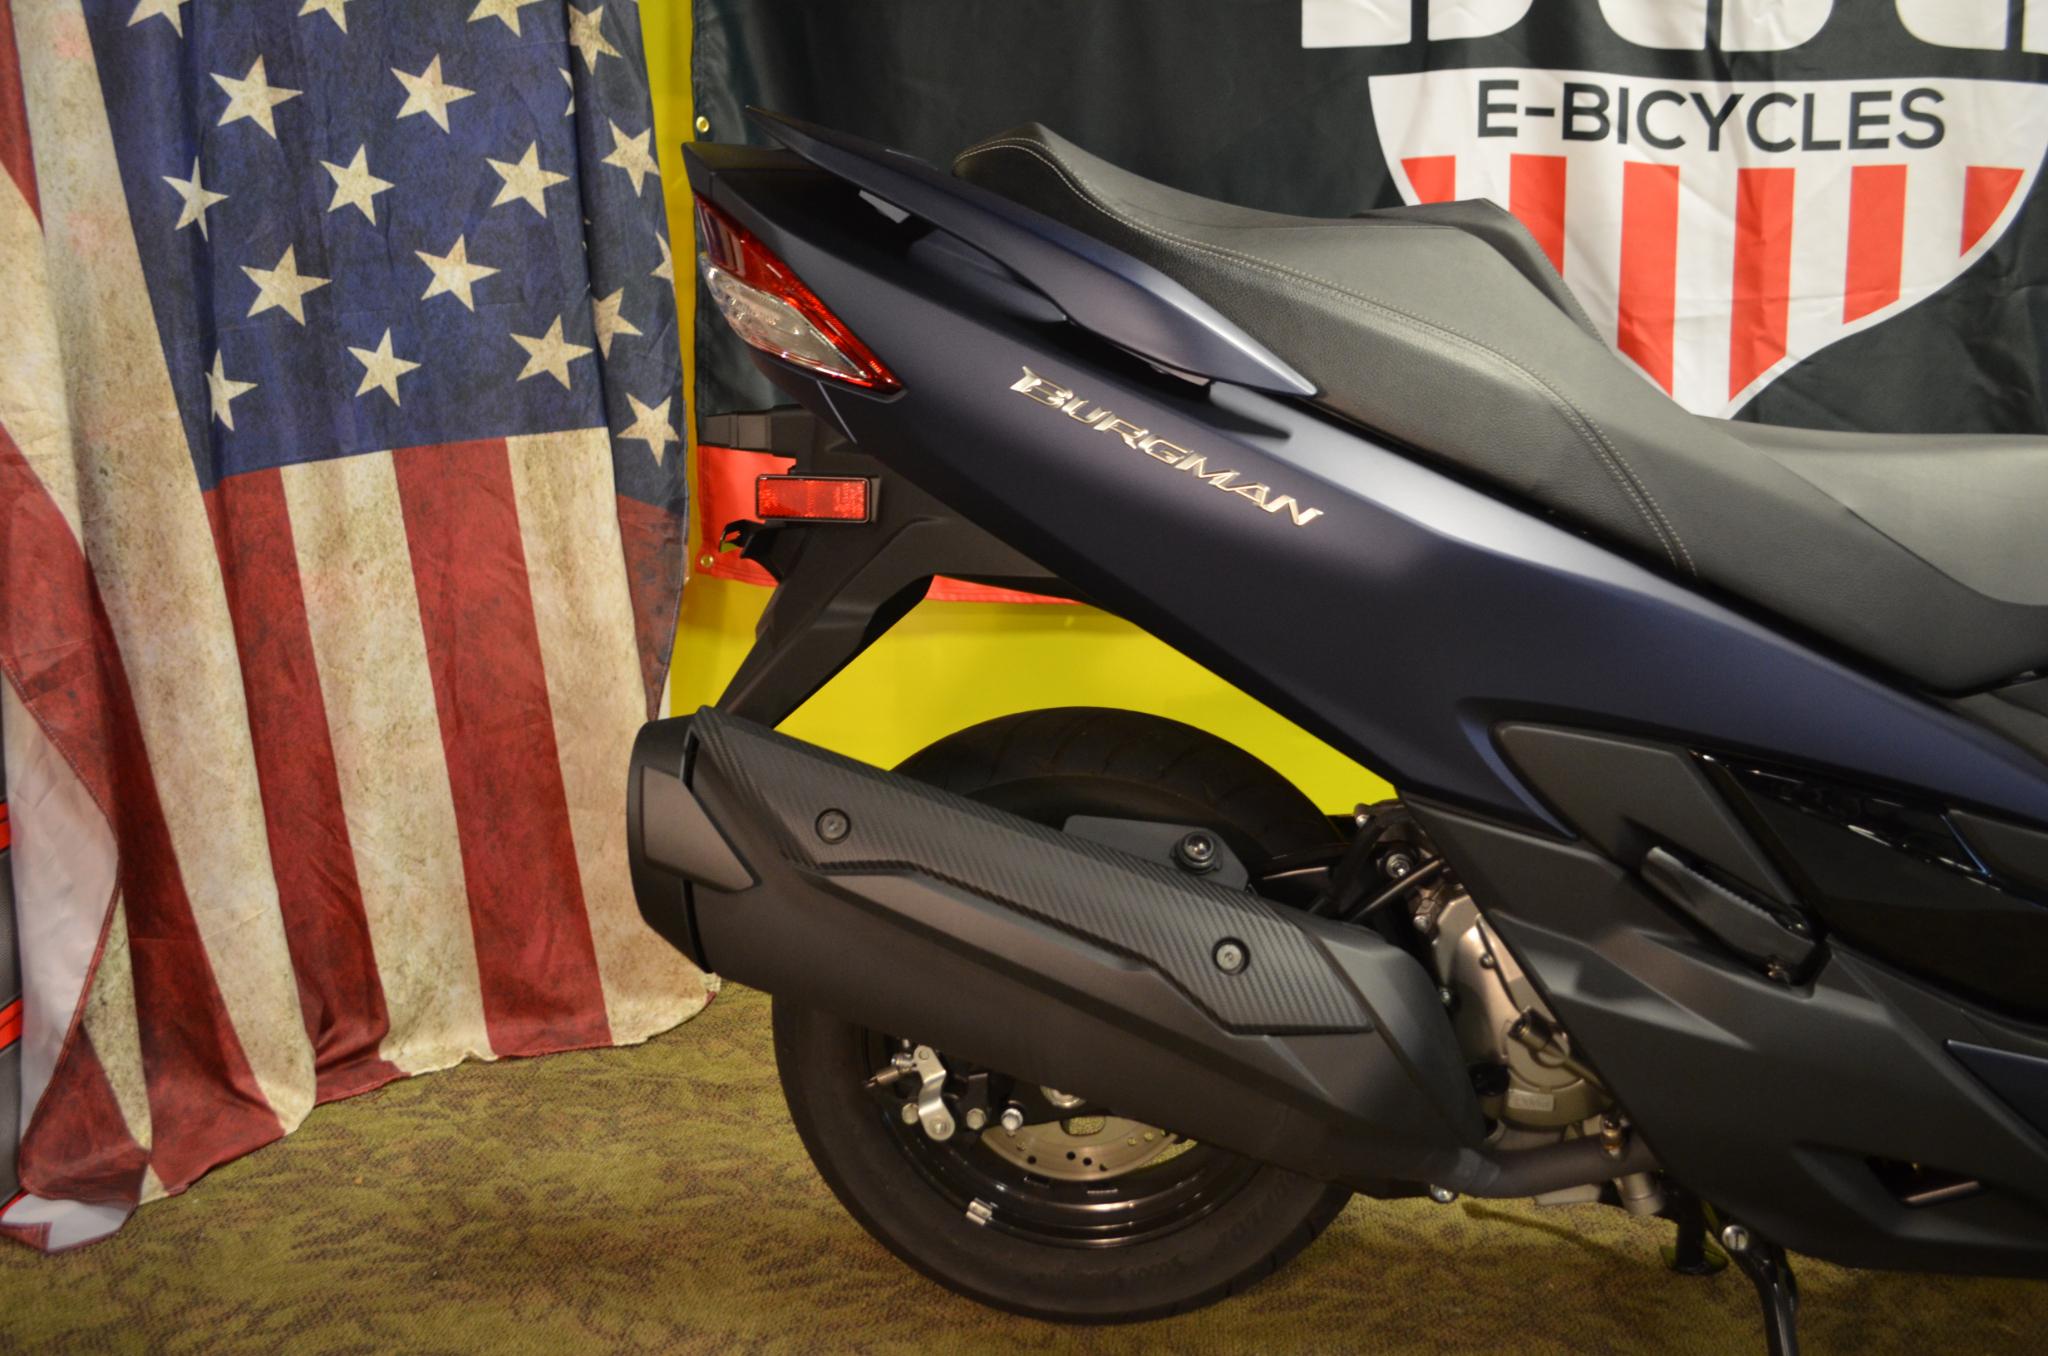 2019 Suzuki Burgman AN400